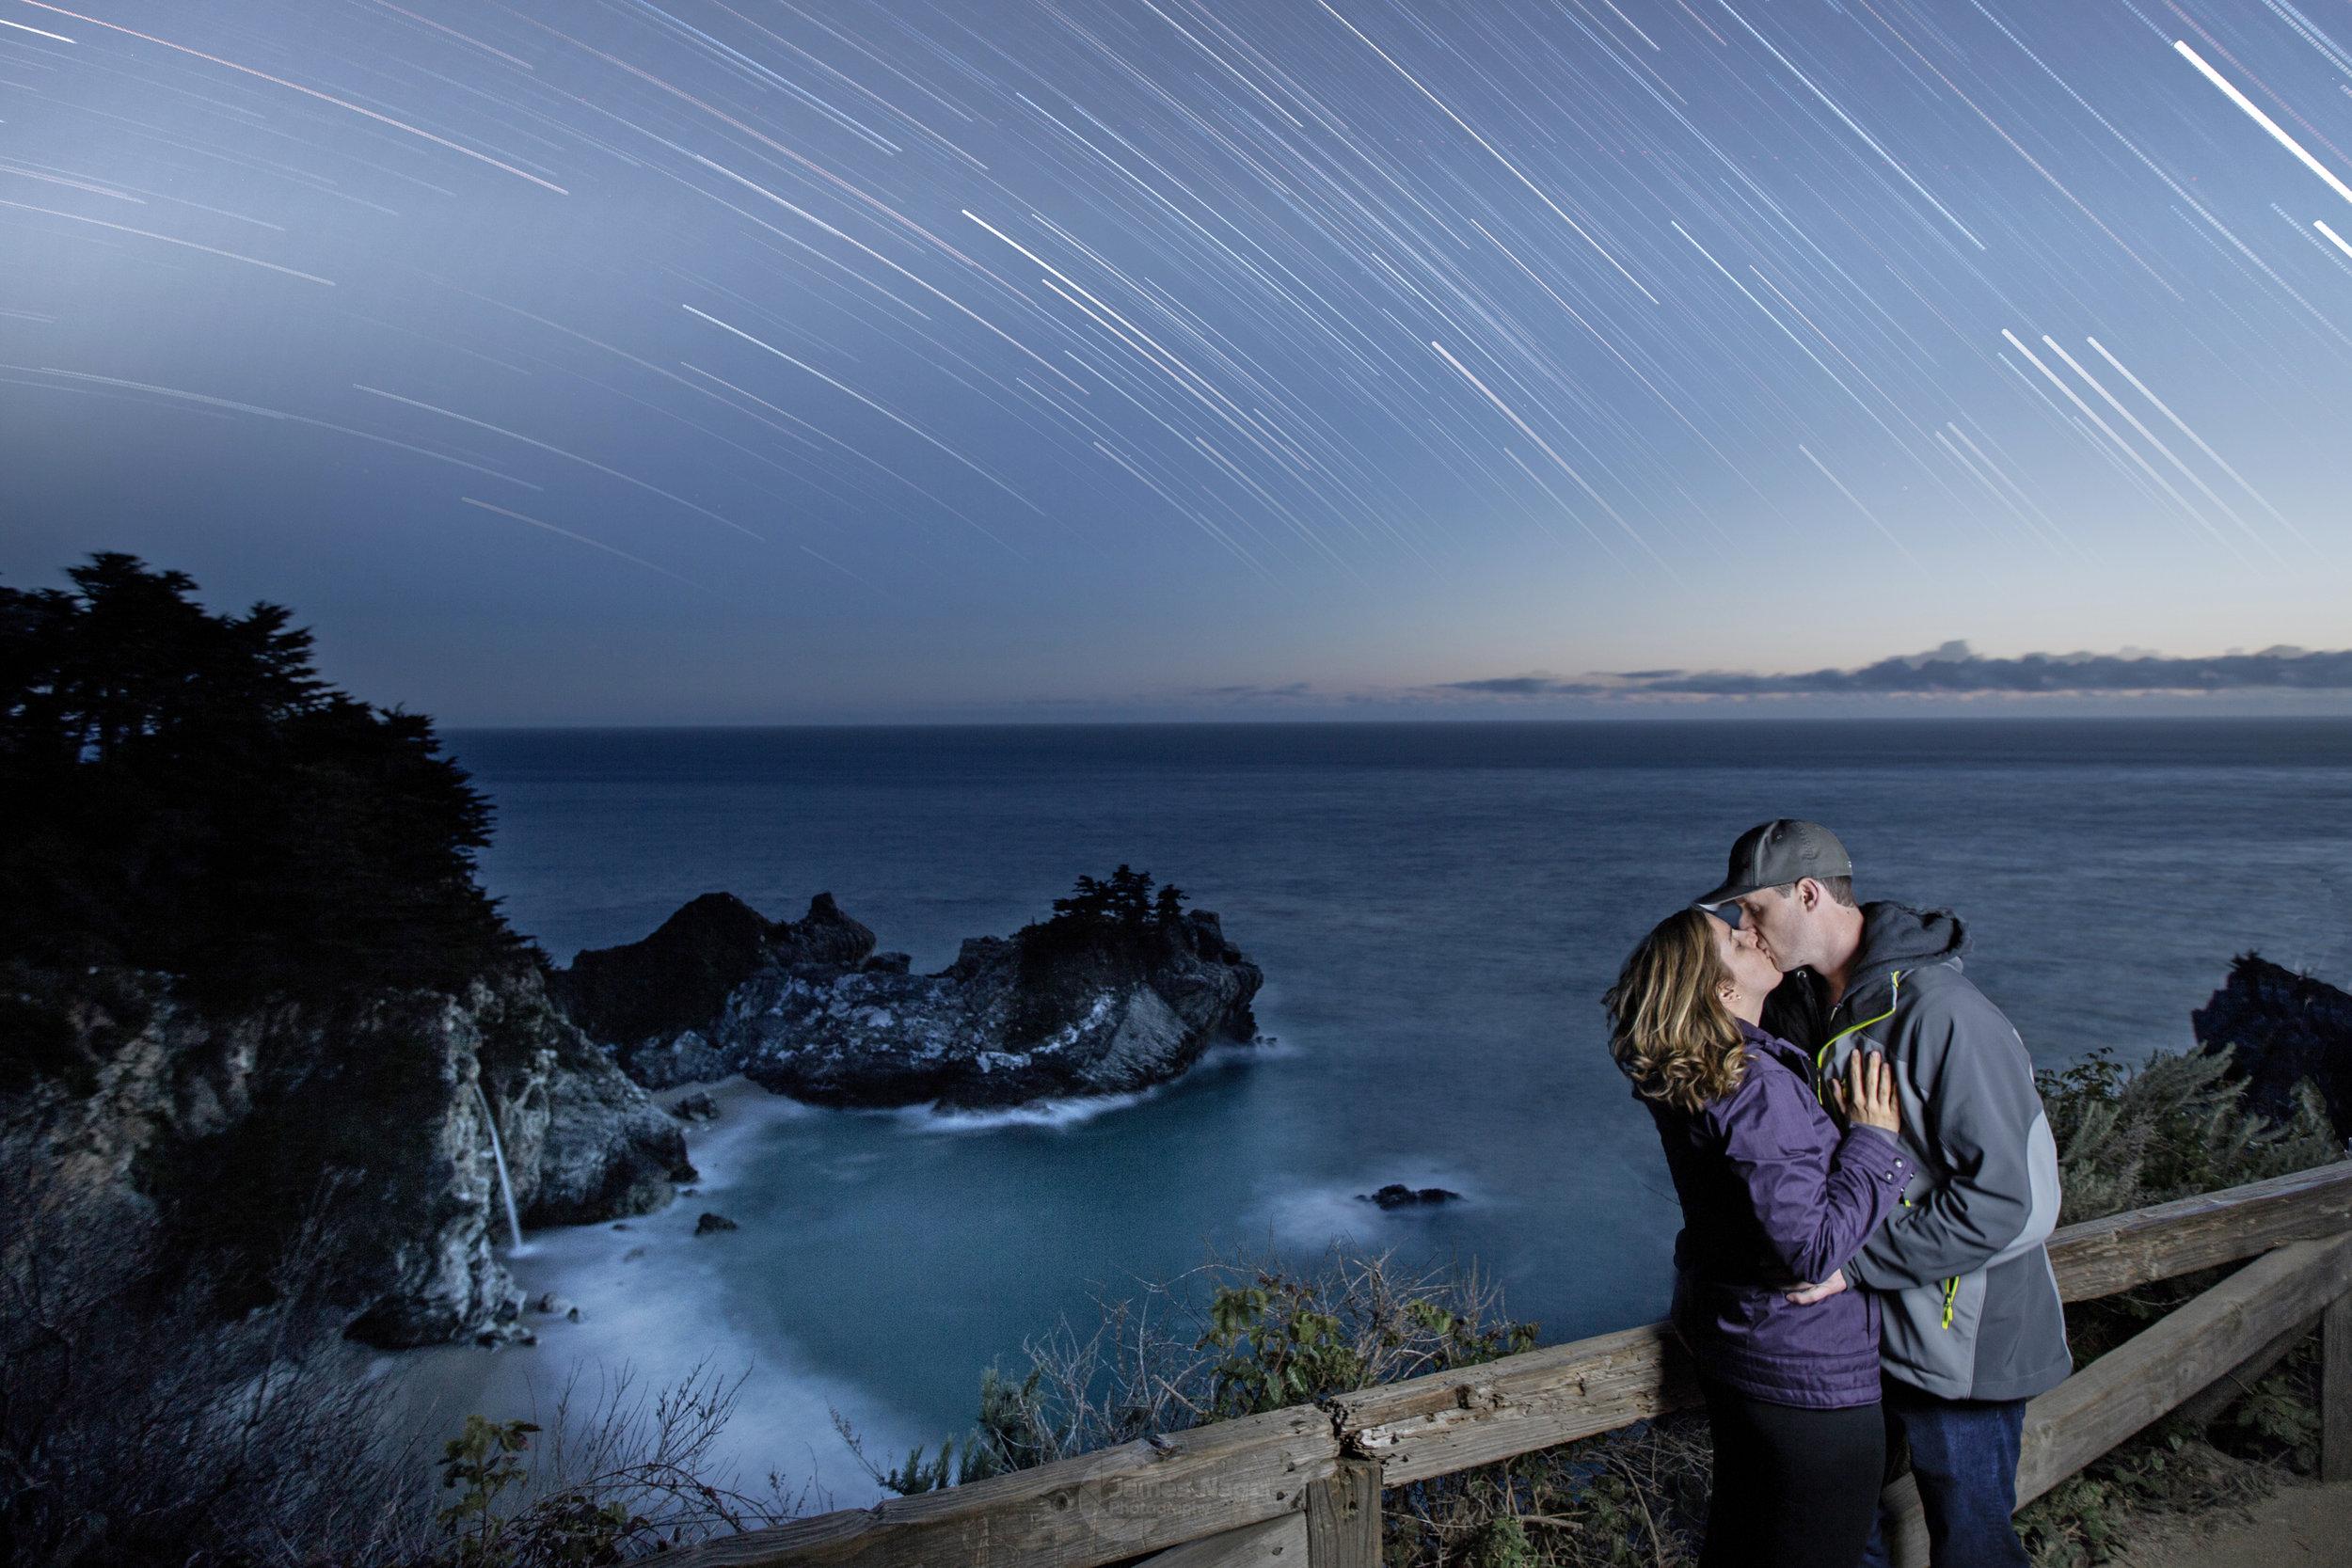 mcway-fall-night-1.jpg